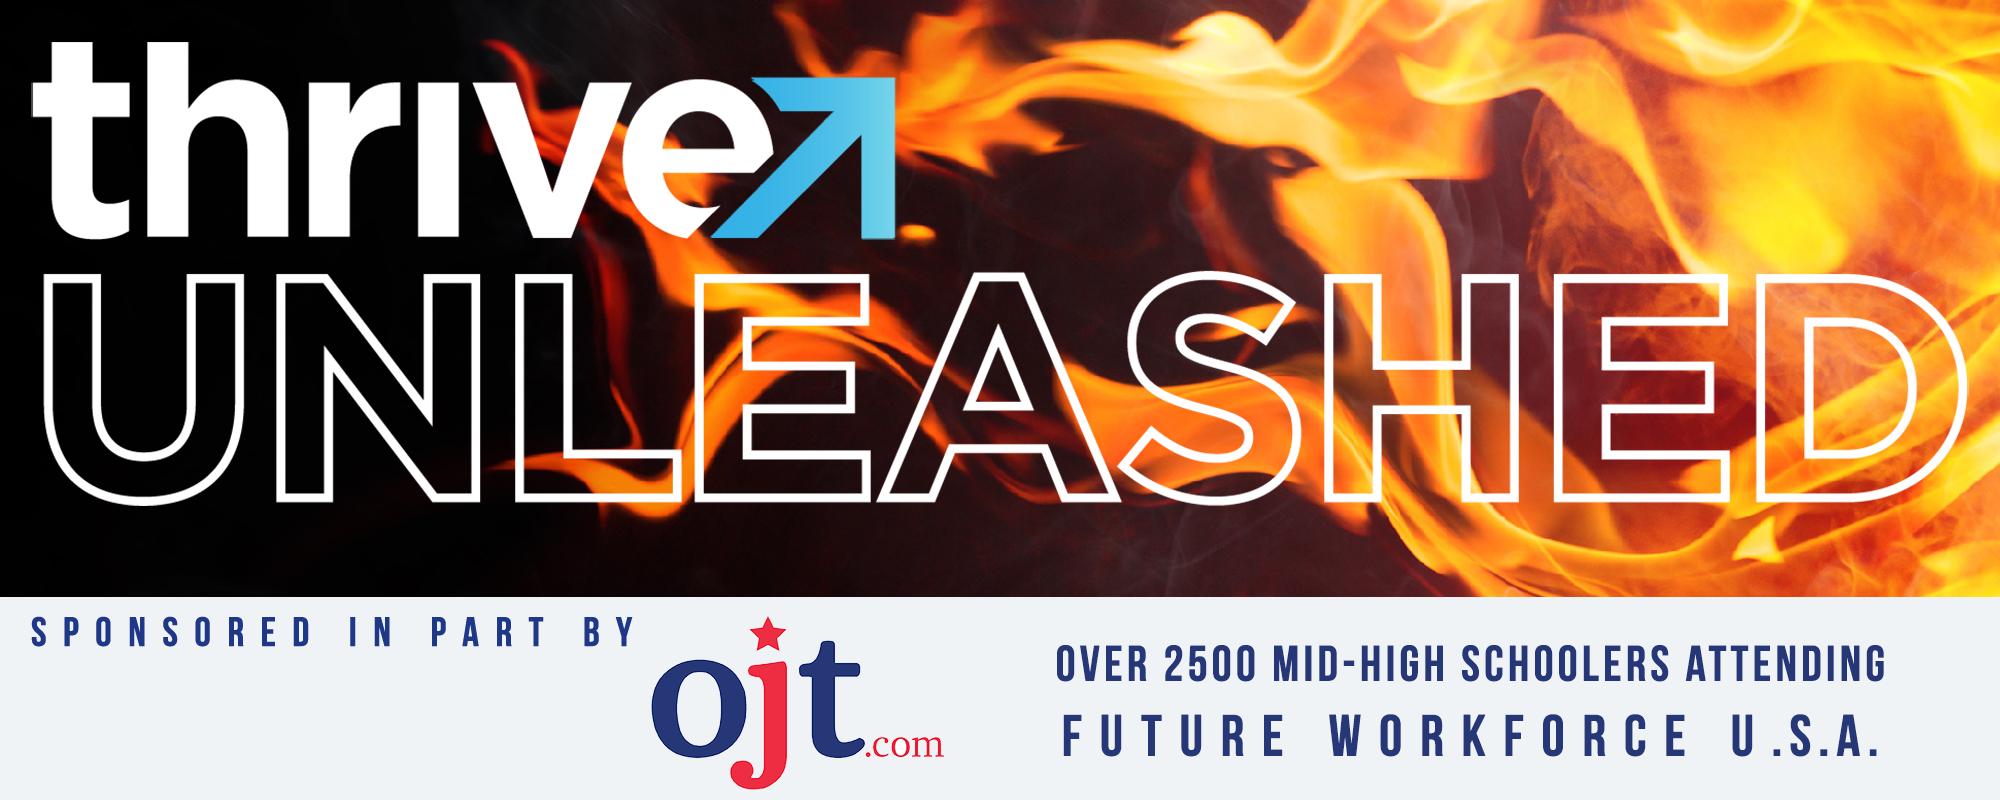 Thrive_Unleashed_Future_Workforce_USA